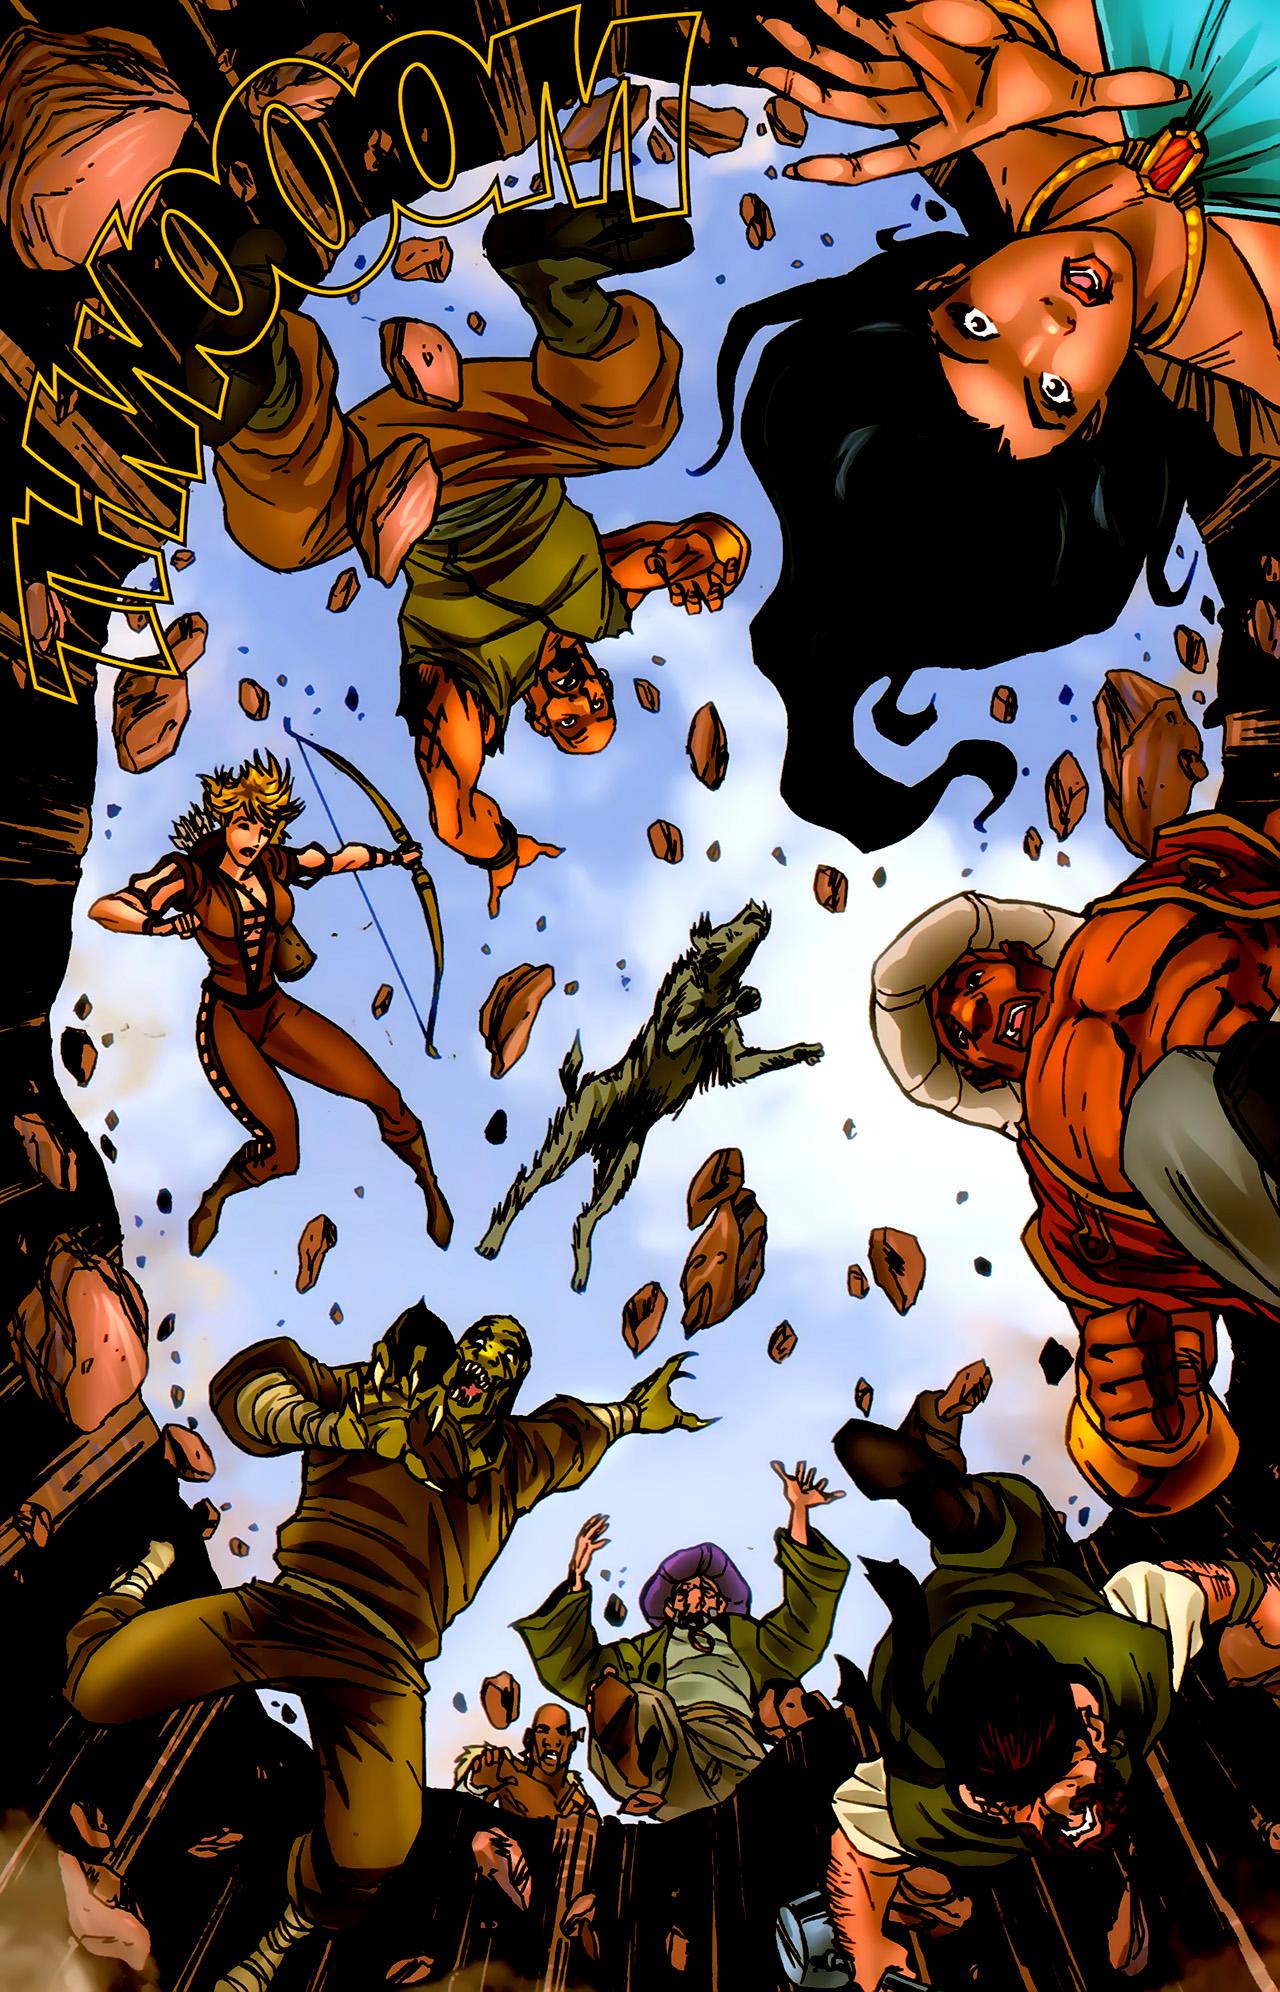 Read online 1001 Arabian Nights: The Adventures of Sinbad comic -  Issue #9 - 22